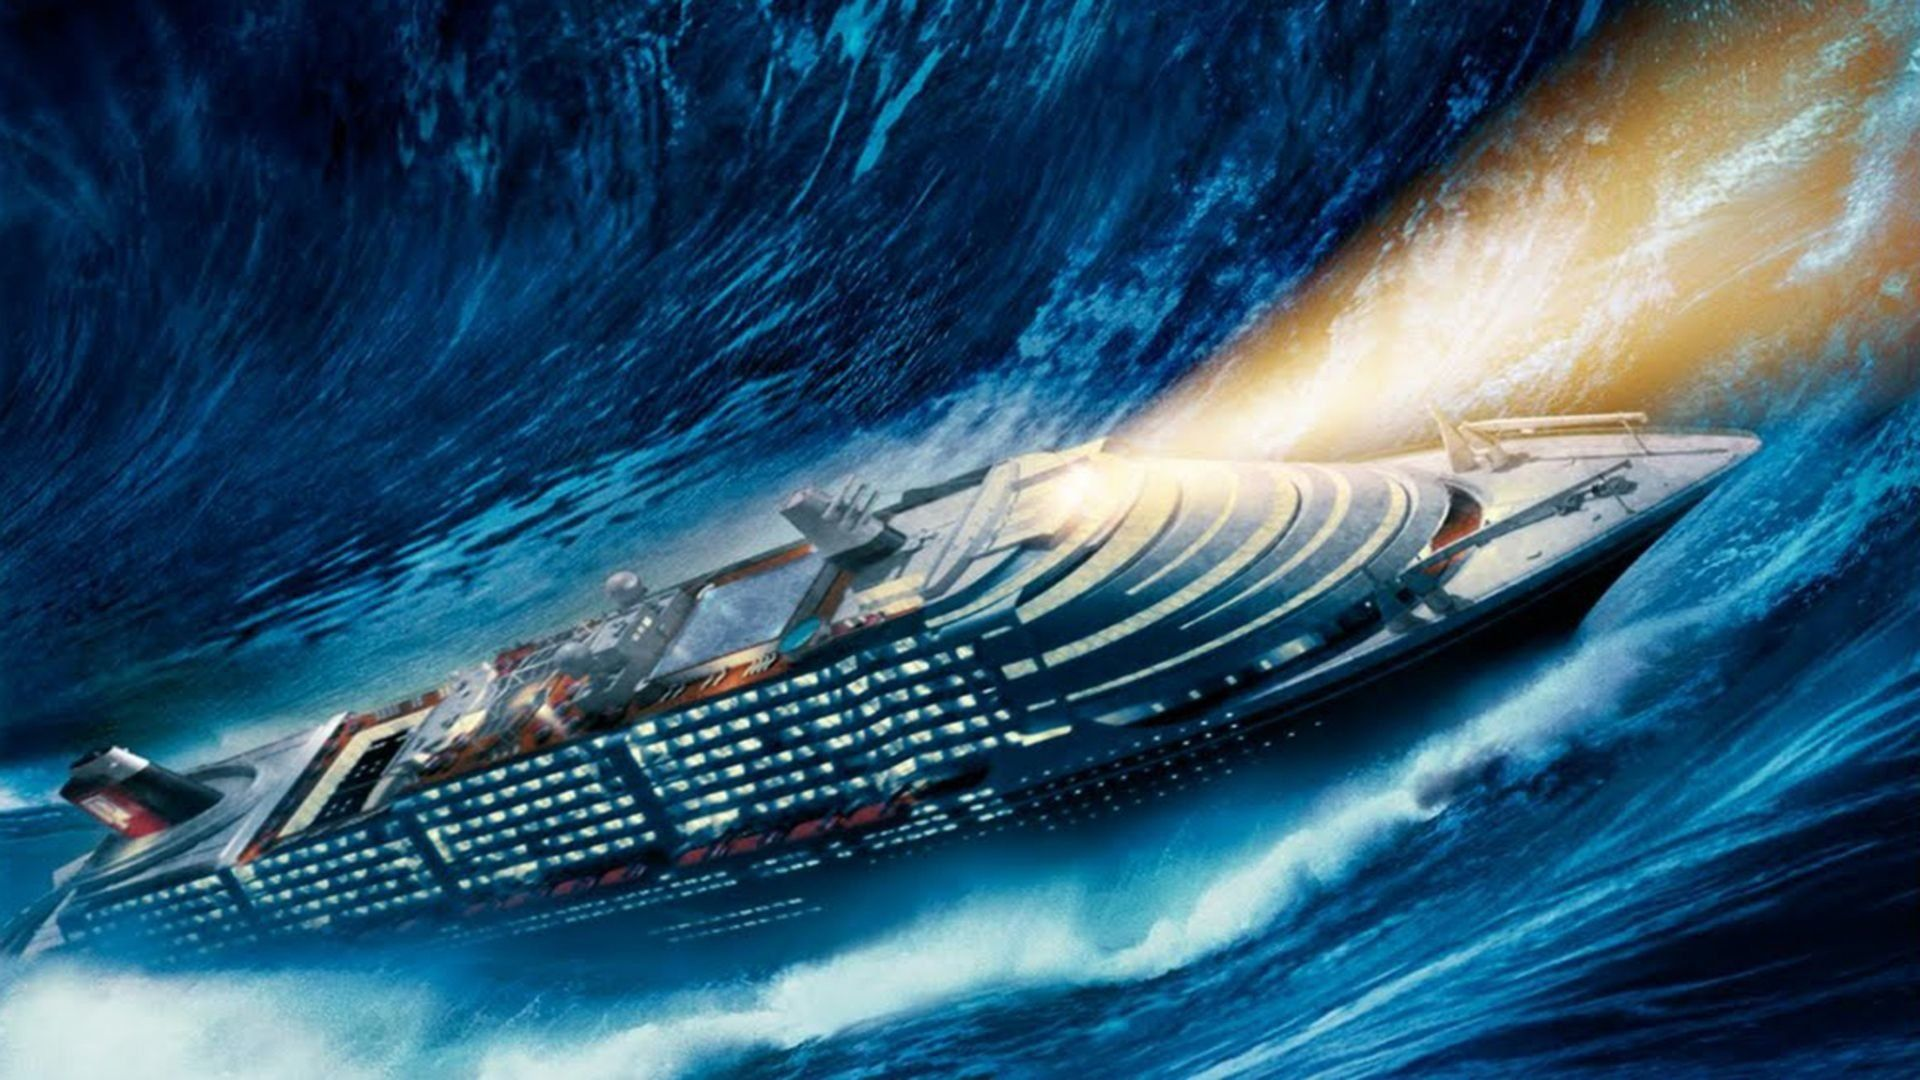 Poseidon Movie Wallpapers Wallpaper Cave